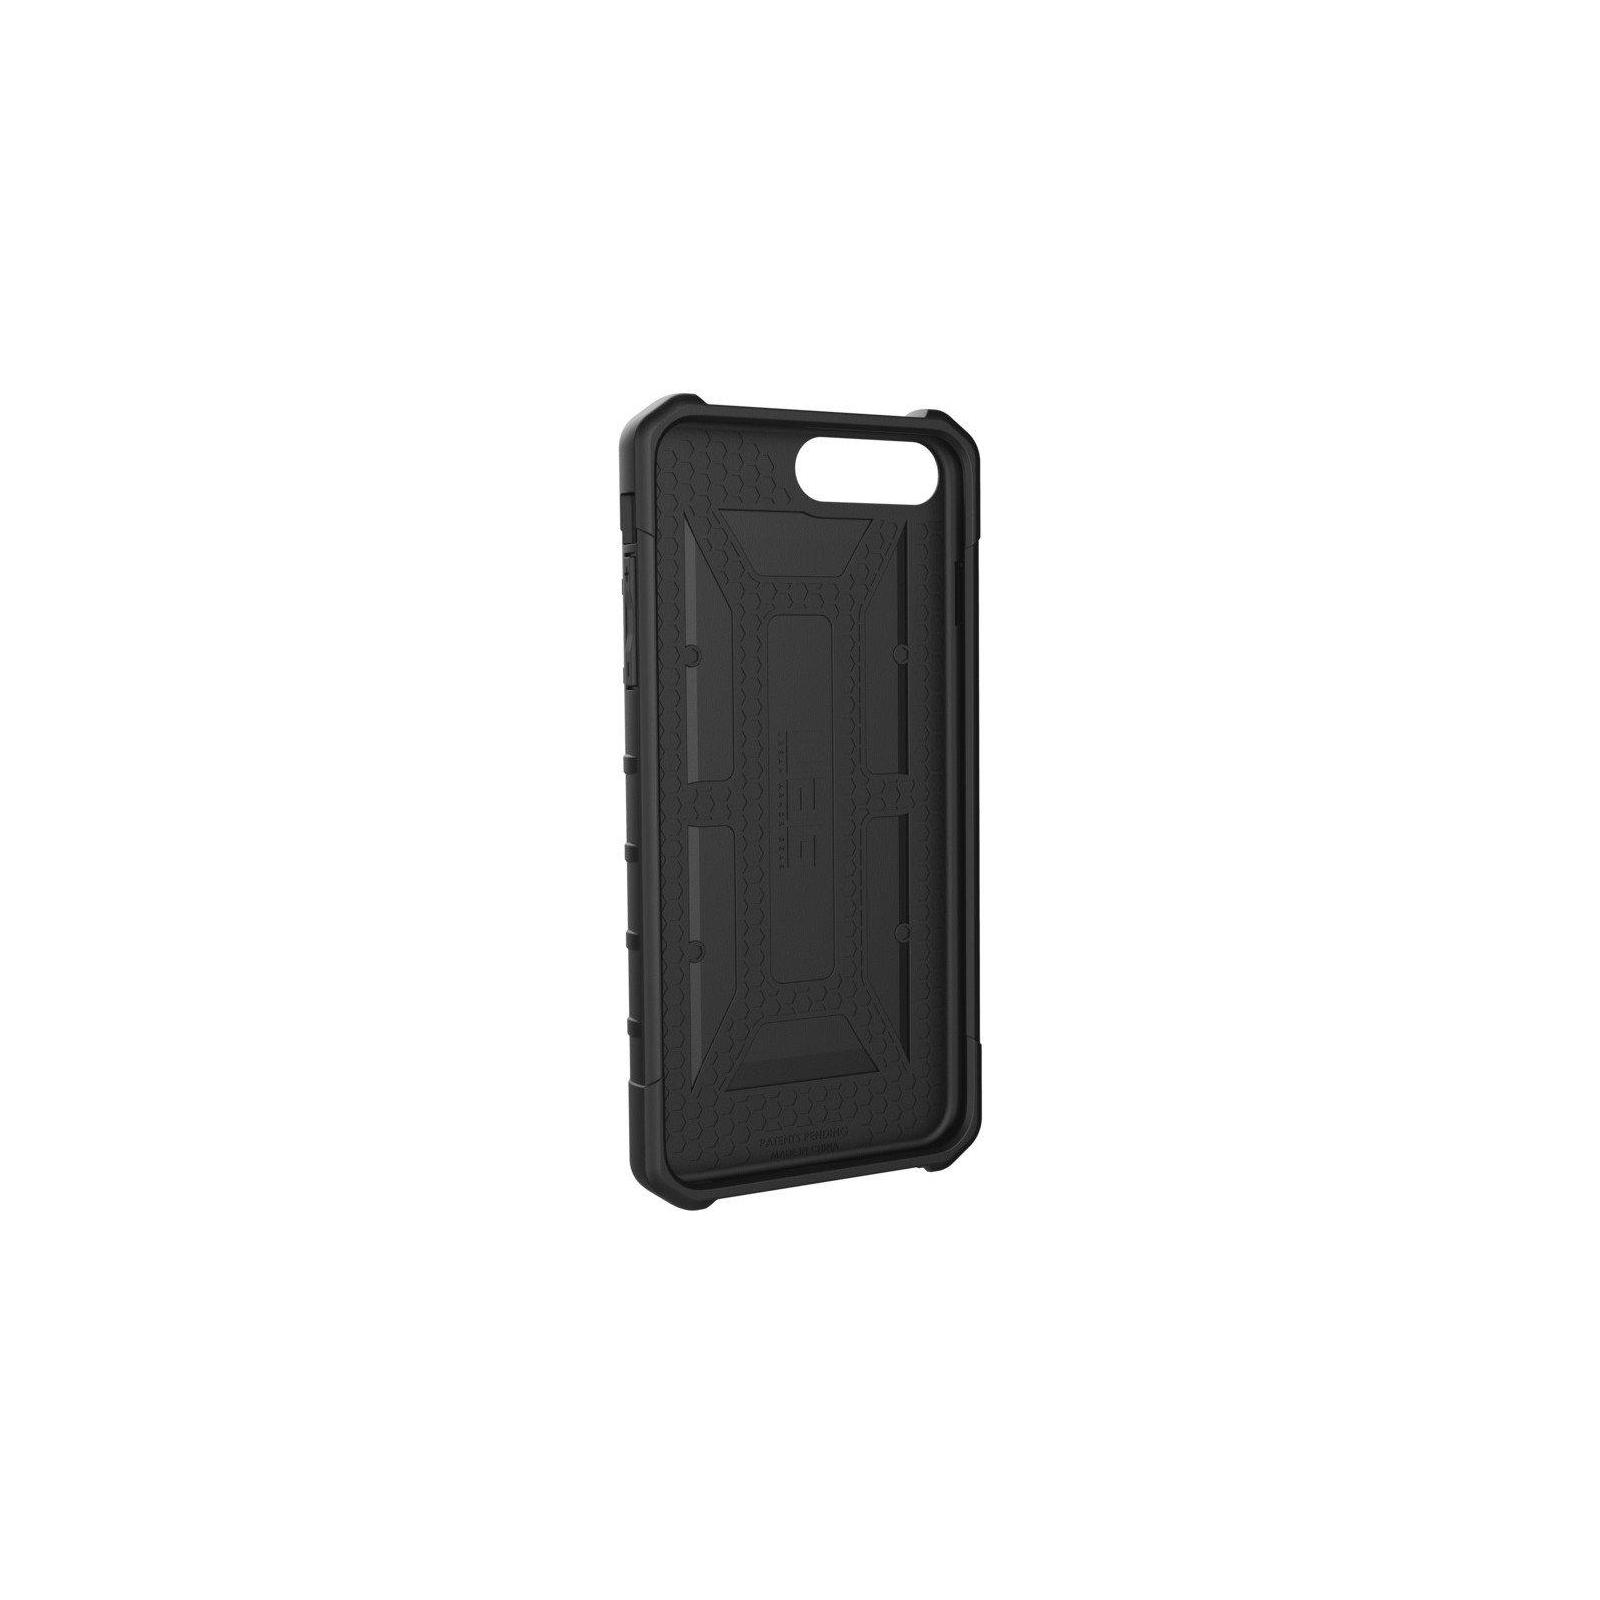 Чехол для моб. телефона Urban Armor Gear iPhone 8/7/6S Plus Pathfinder Camo Gray/Black (IPH8/7PLS-A-BC) изображение 2